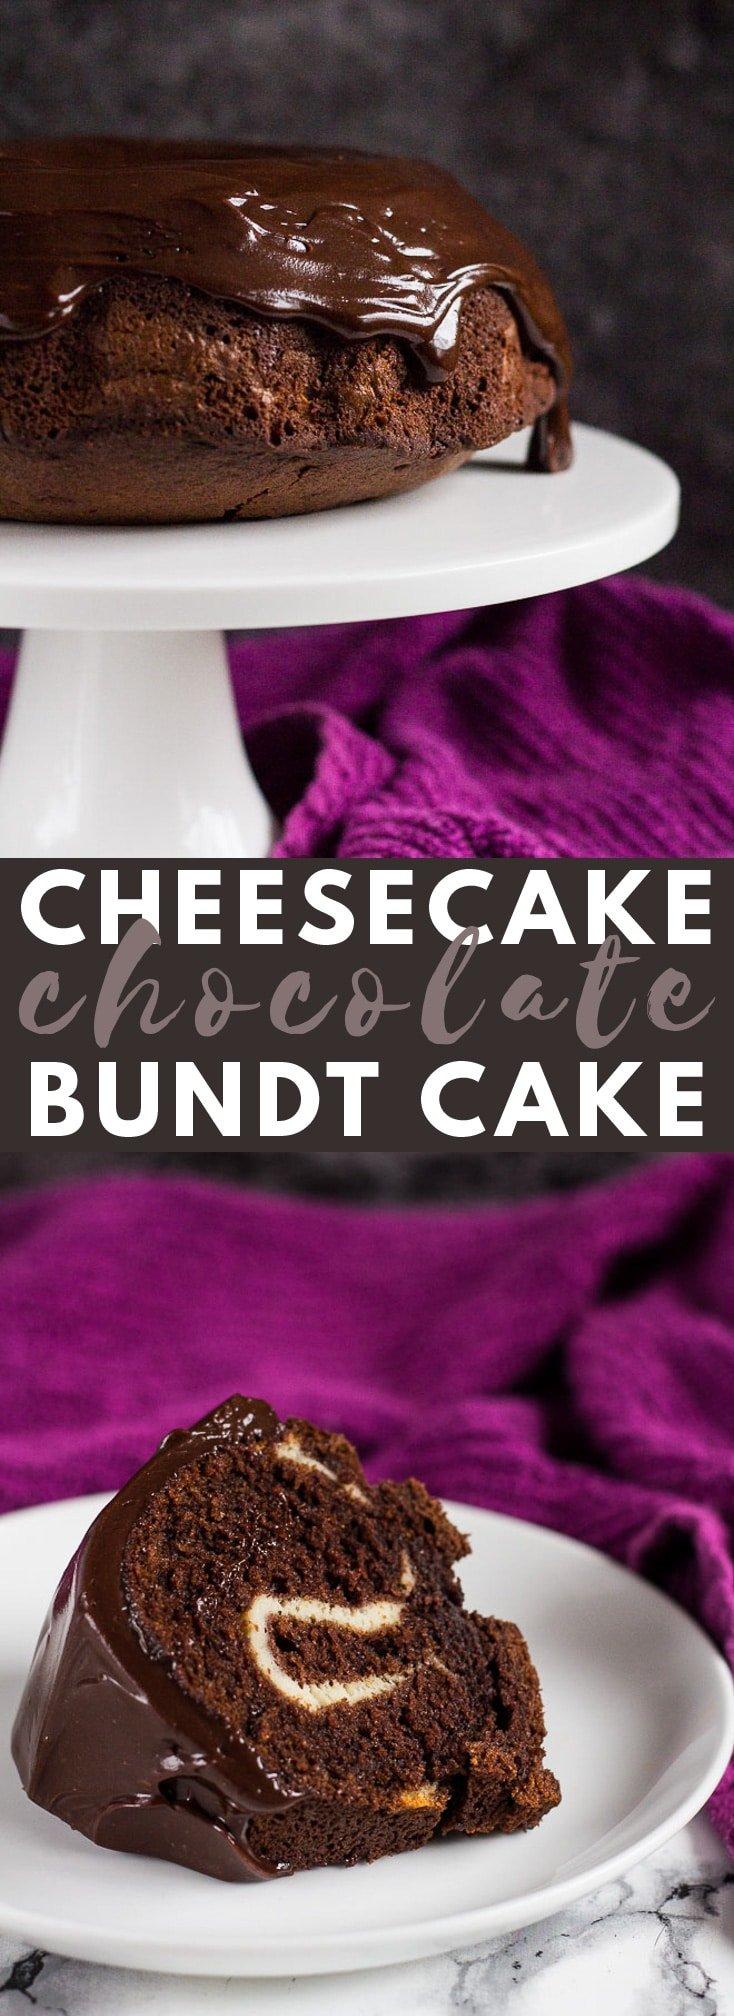 Cheesecake Swirl Chocolate Bundt Cake- Deliciously moist and fluffy chocolate Bundt cake, swirled with a thick and creamy vanilla cheesecake centre! #chocolatecake #bundtcake #cakerecipes